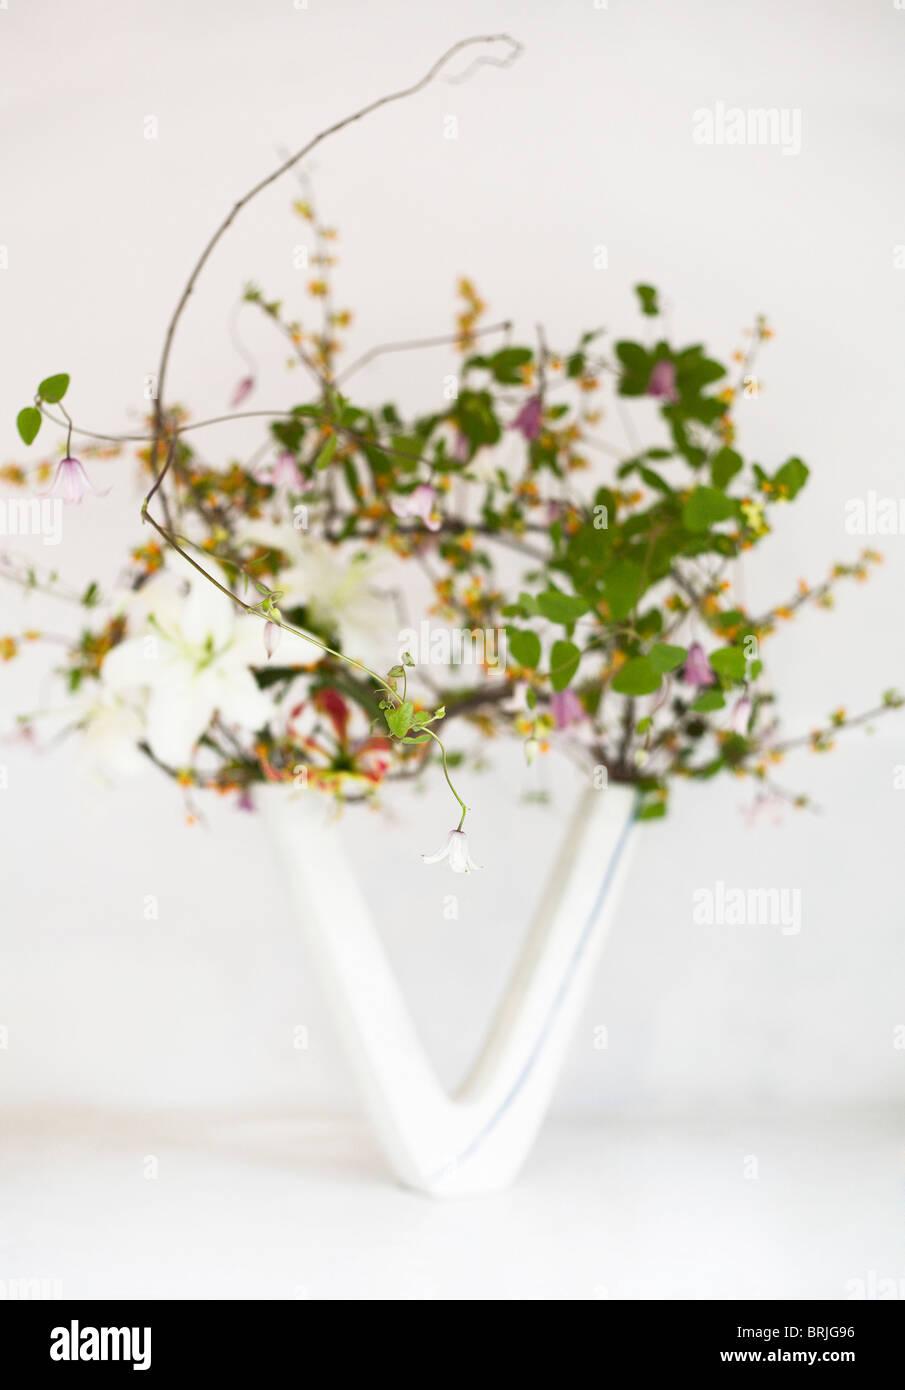 Ikebana or Japanese flower art in \u0027V\u0027 shaped vase with white background.  sc 1 st  Alamy & Ikebana or Japanese flower art in \u0027V\u0027 shaped vase with white Stock ...